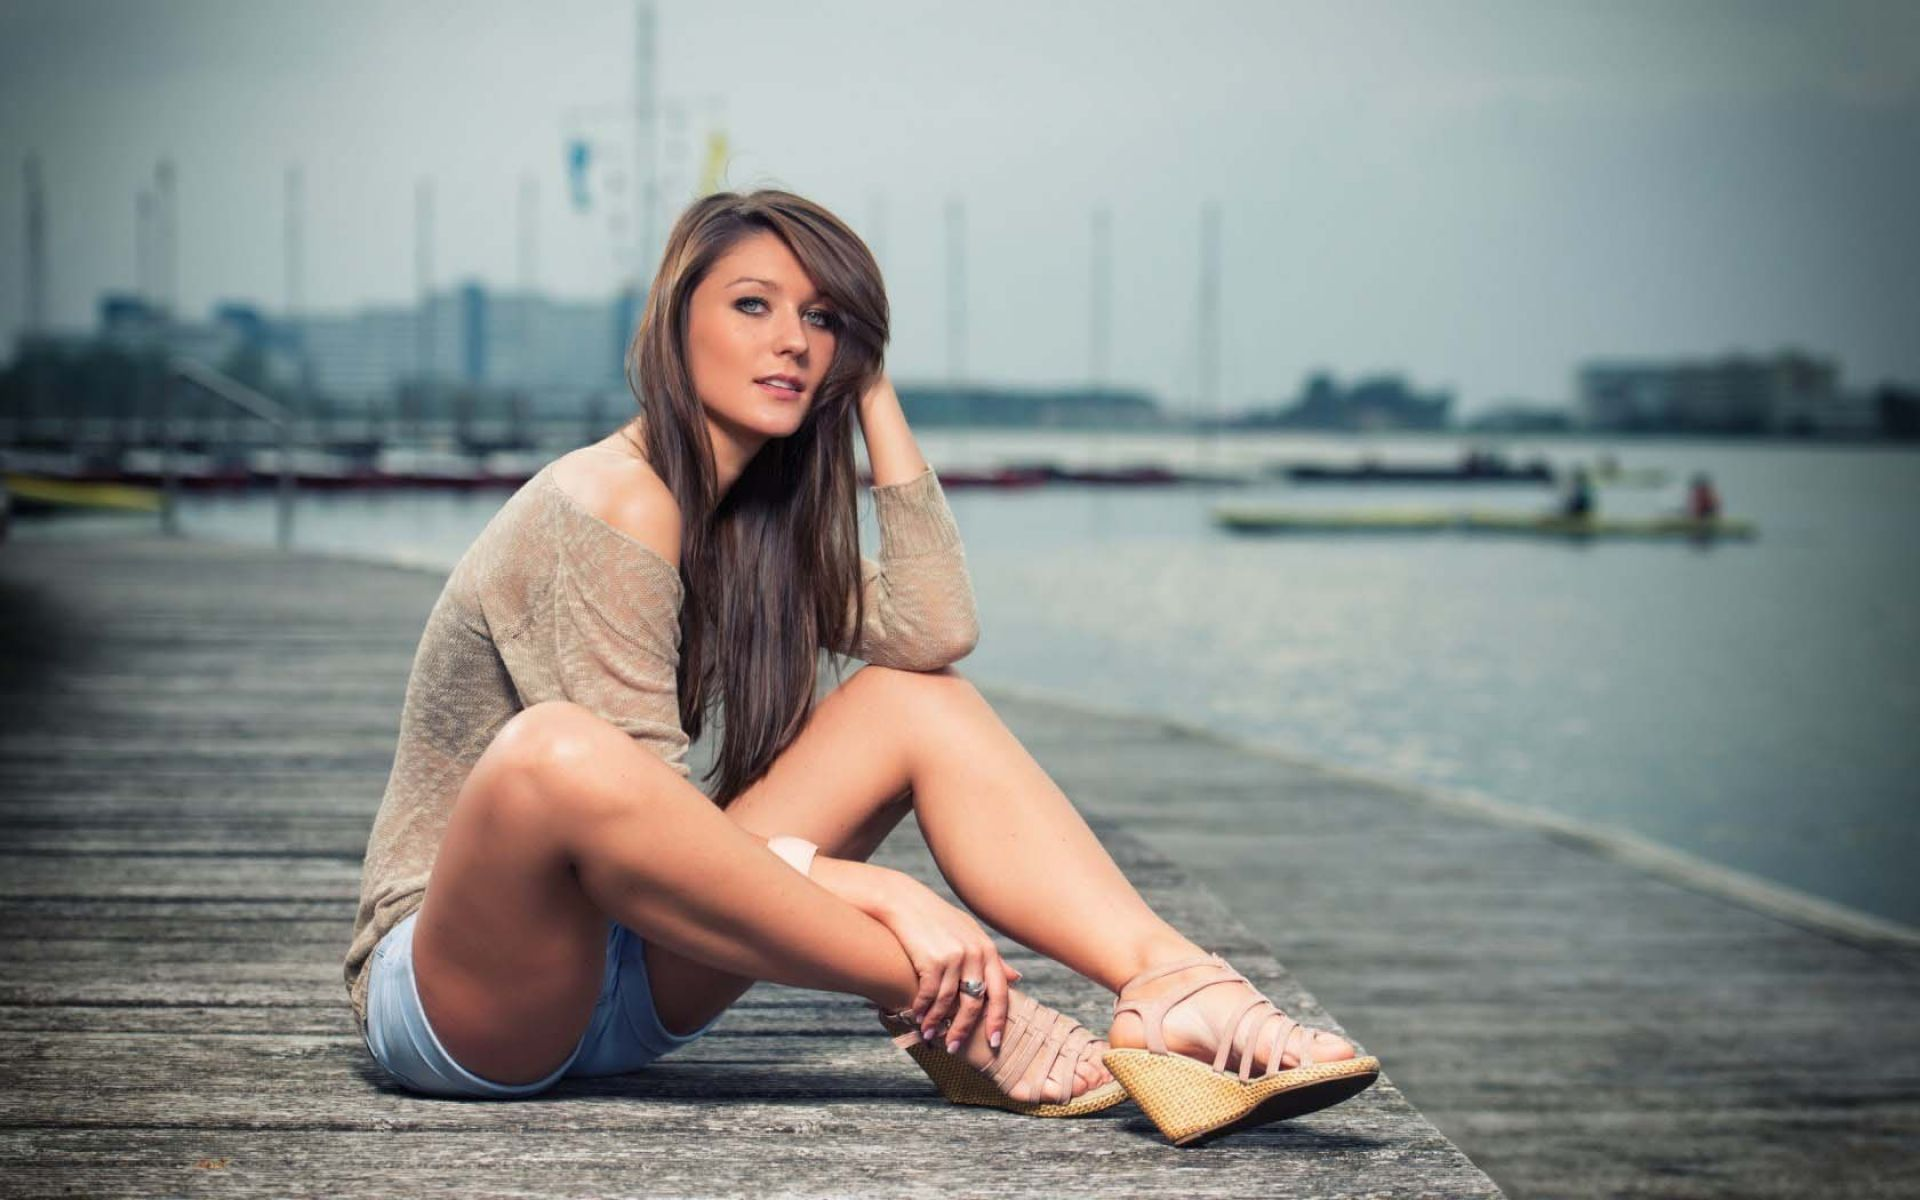 beautiful girl hd wallpaper,photograph,sitting,beauty,leg,human leg